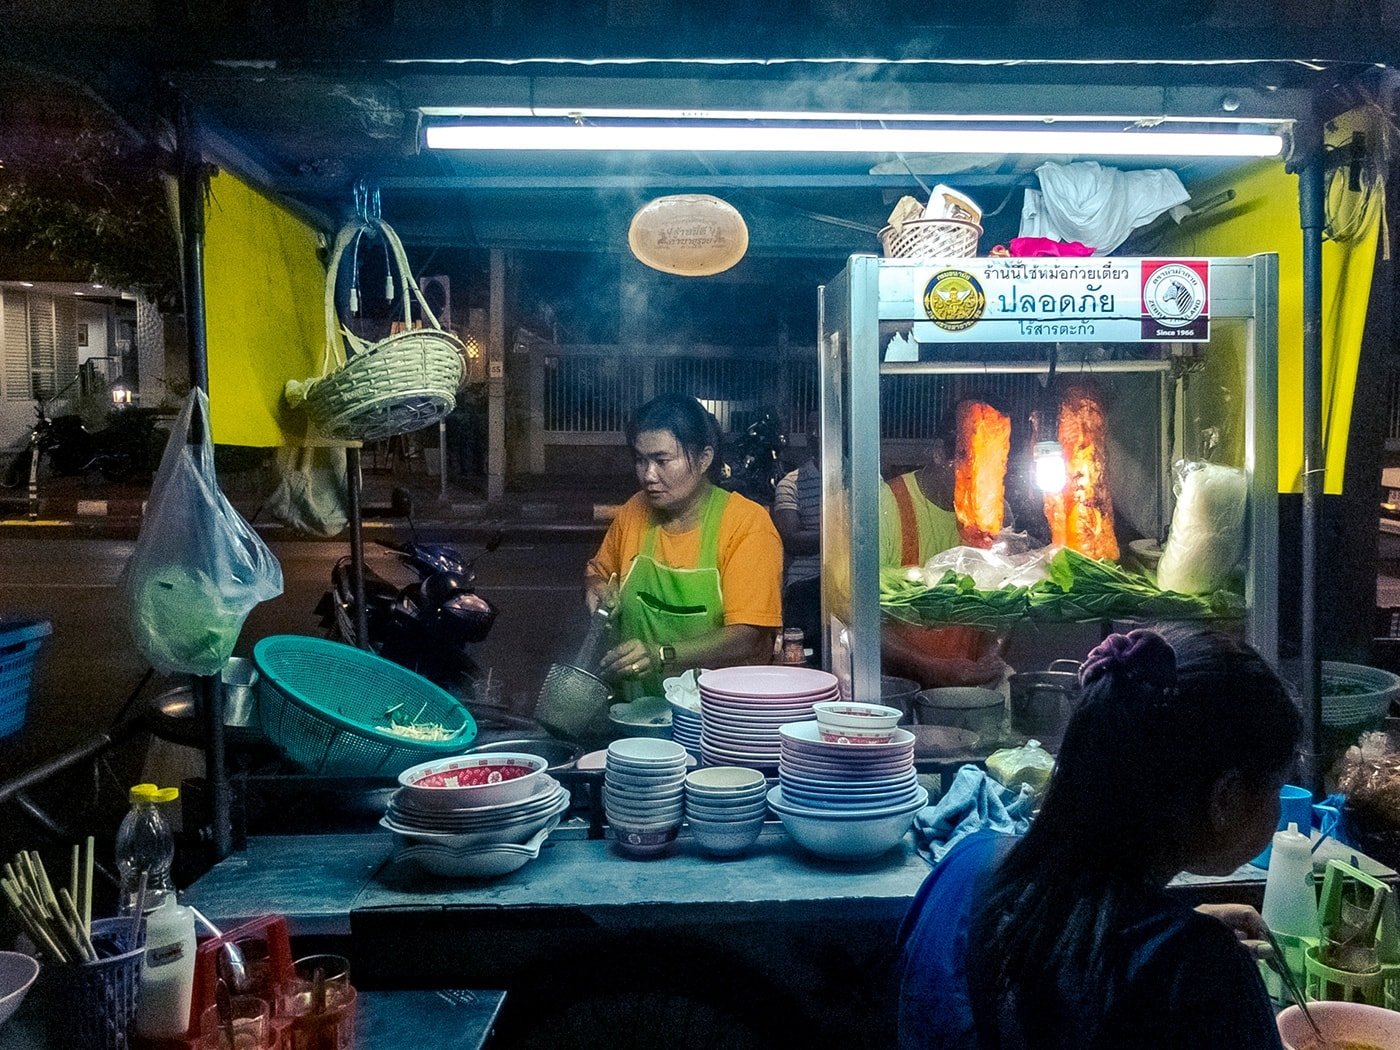 thailandia in moto bangkok street food